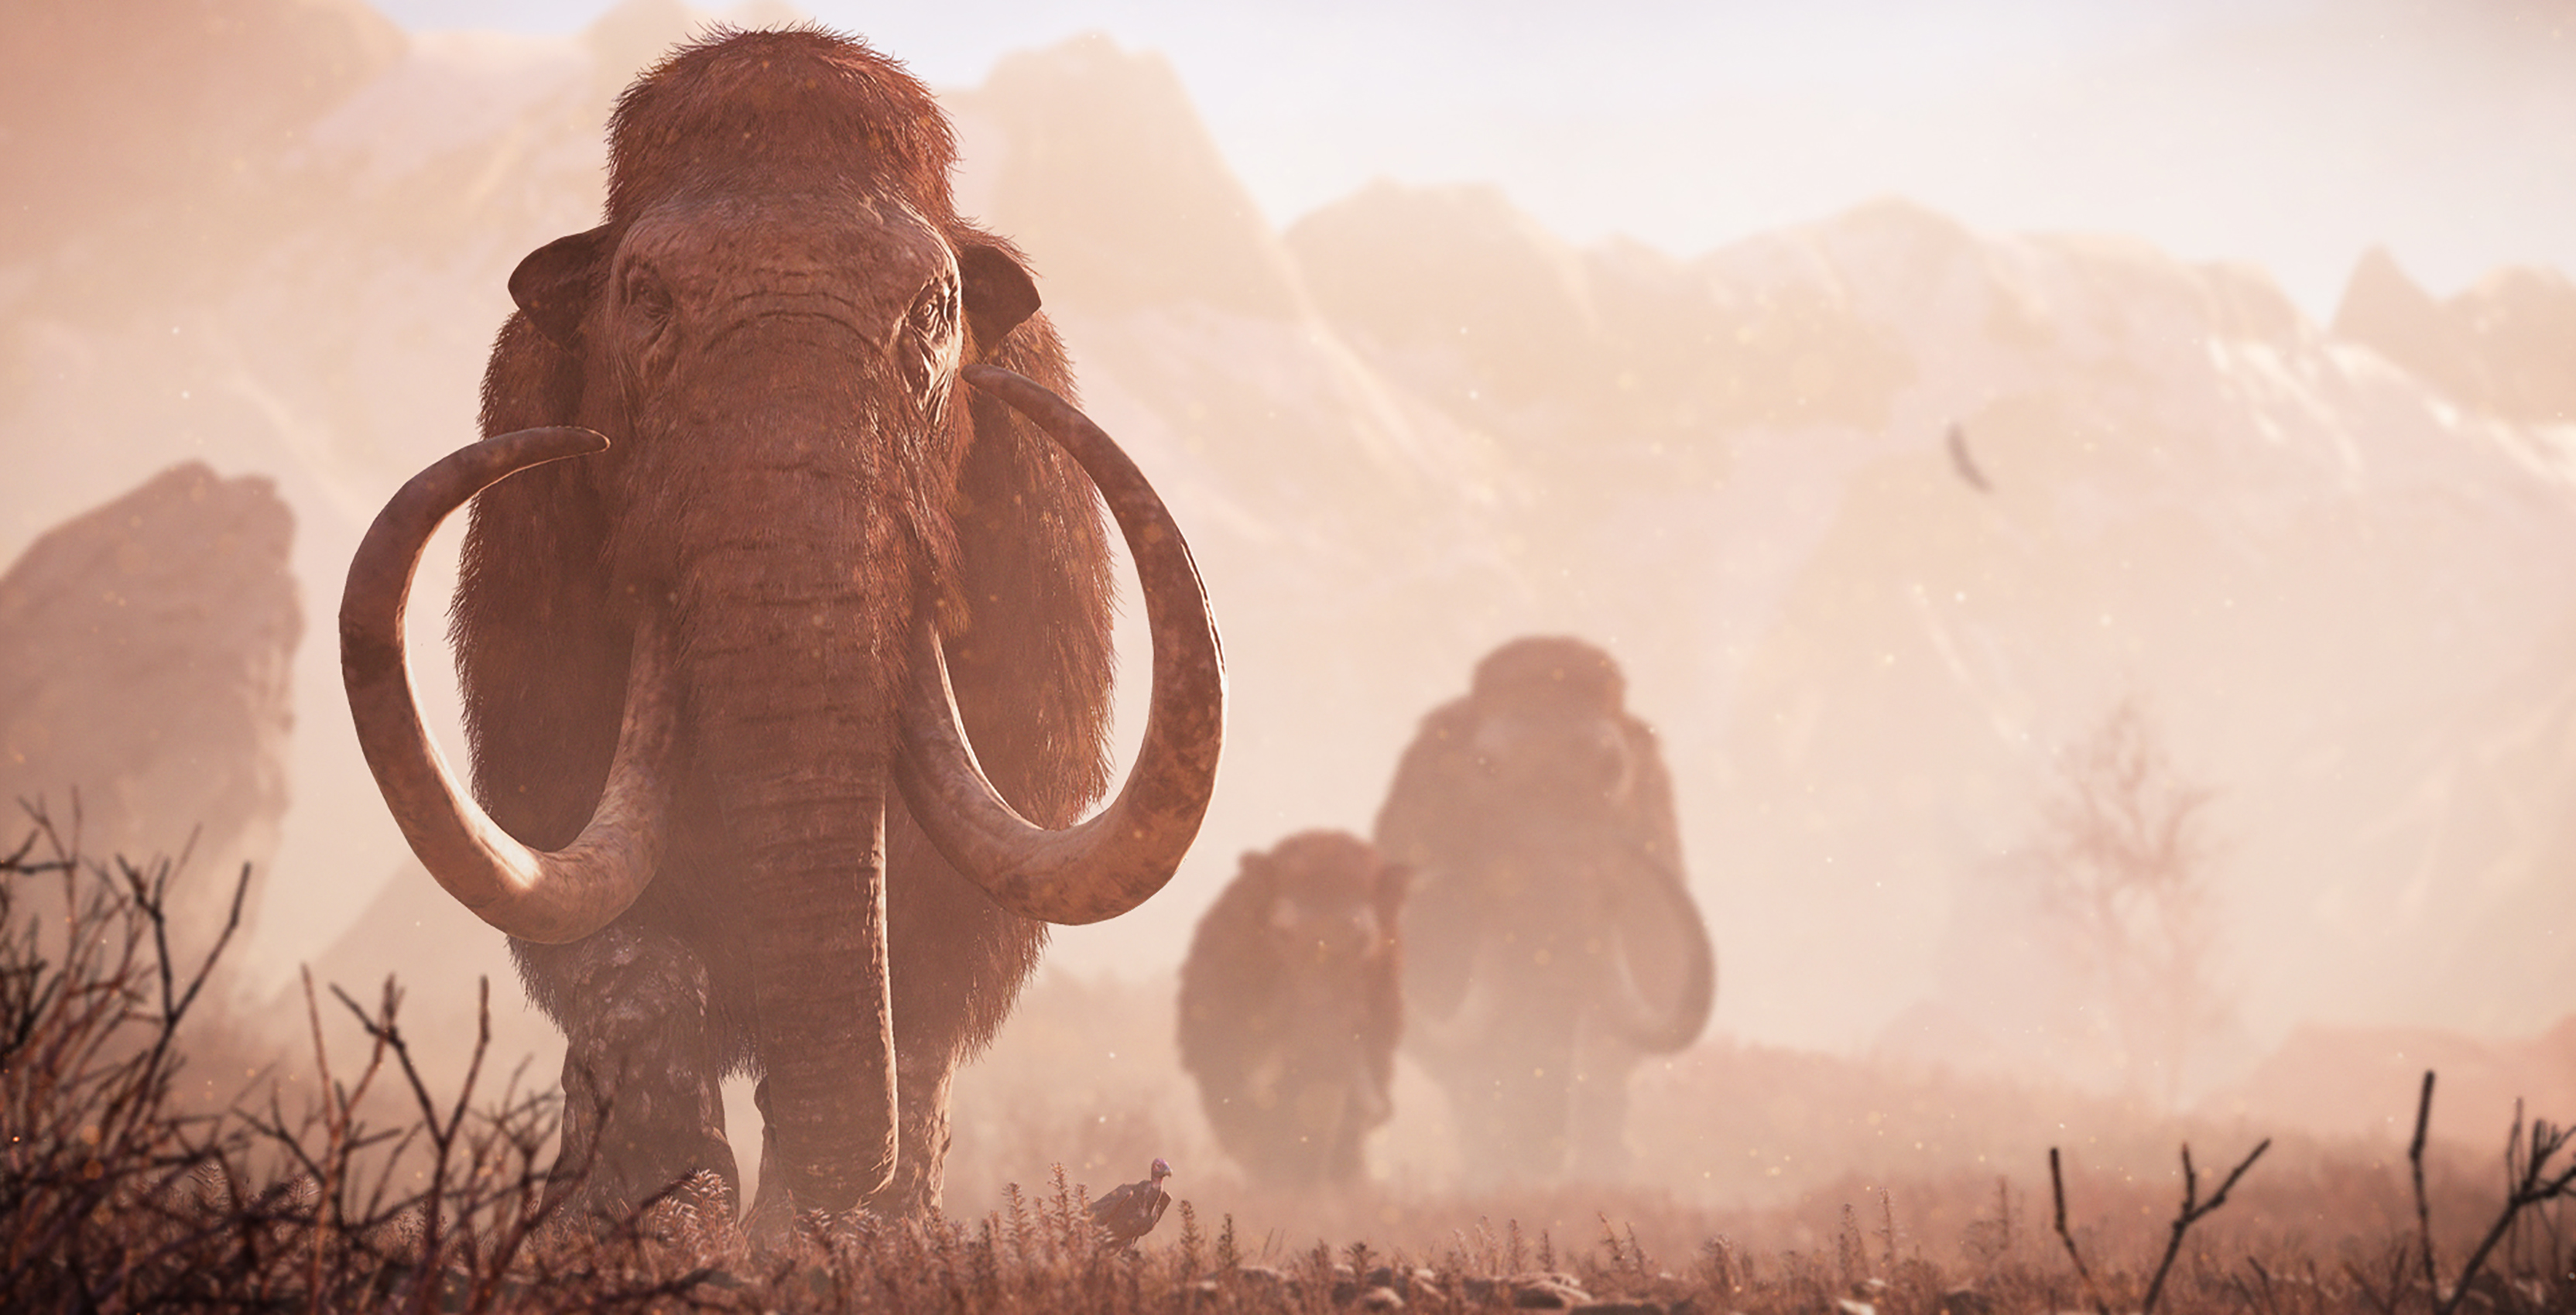 Ubisoft's Far Cry Primal